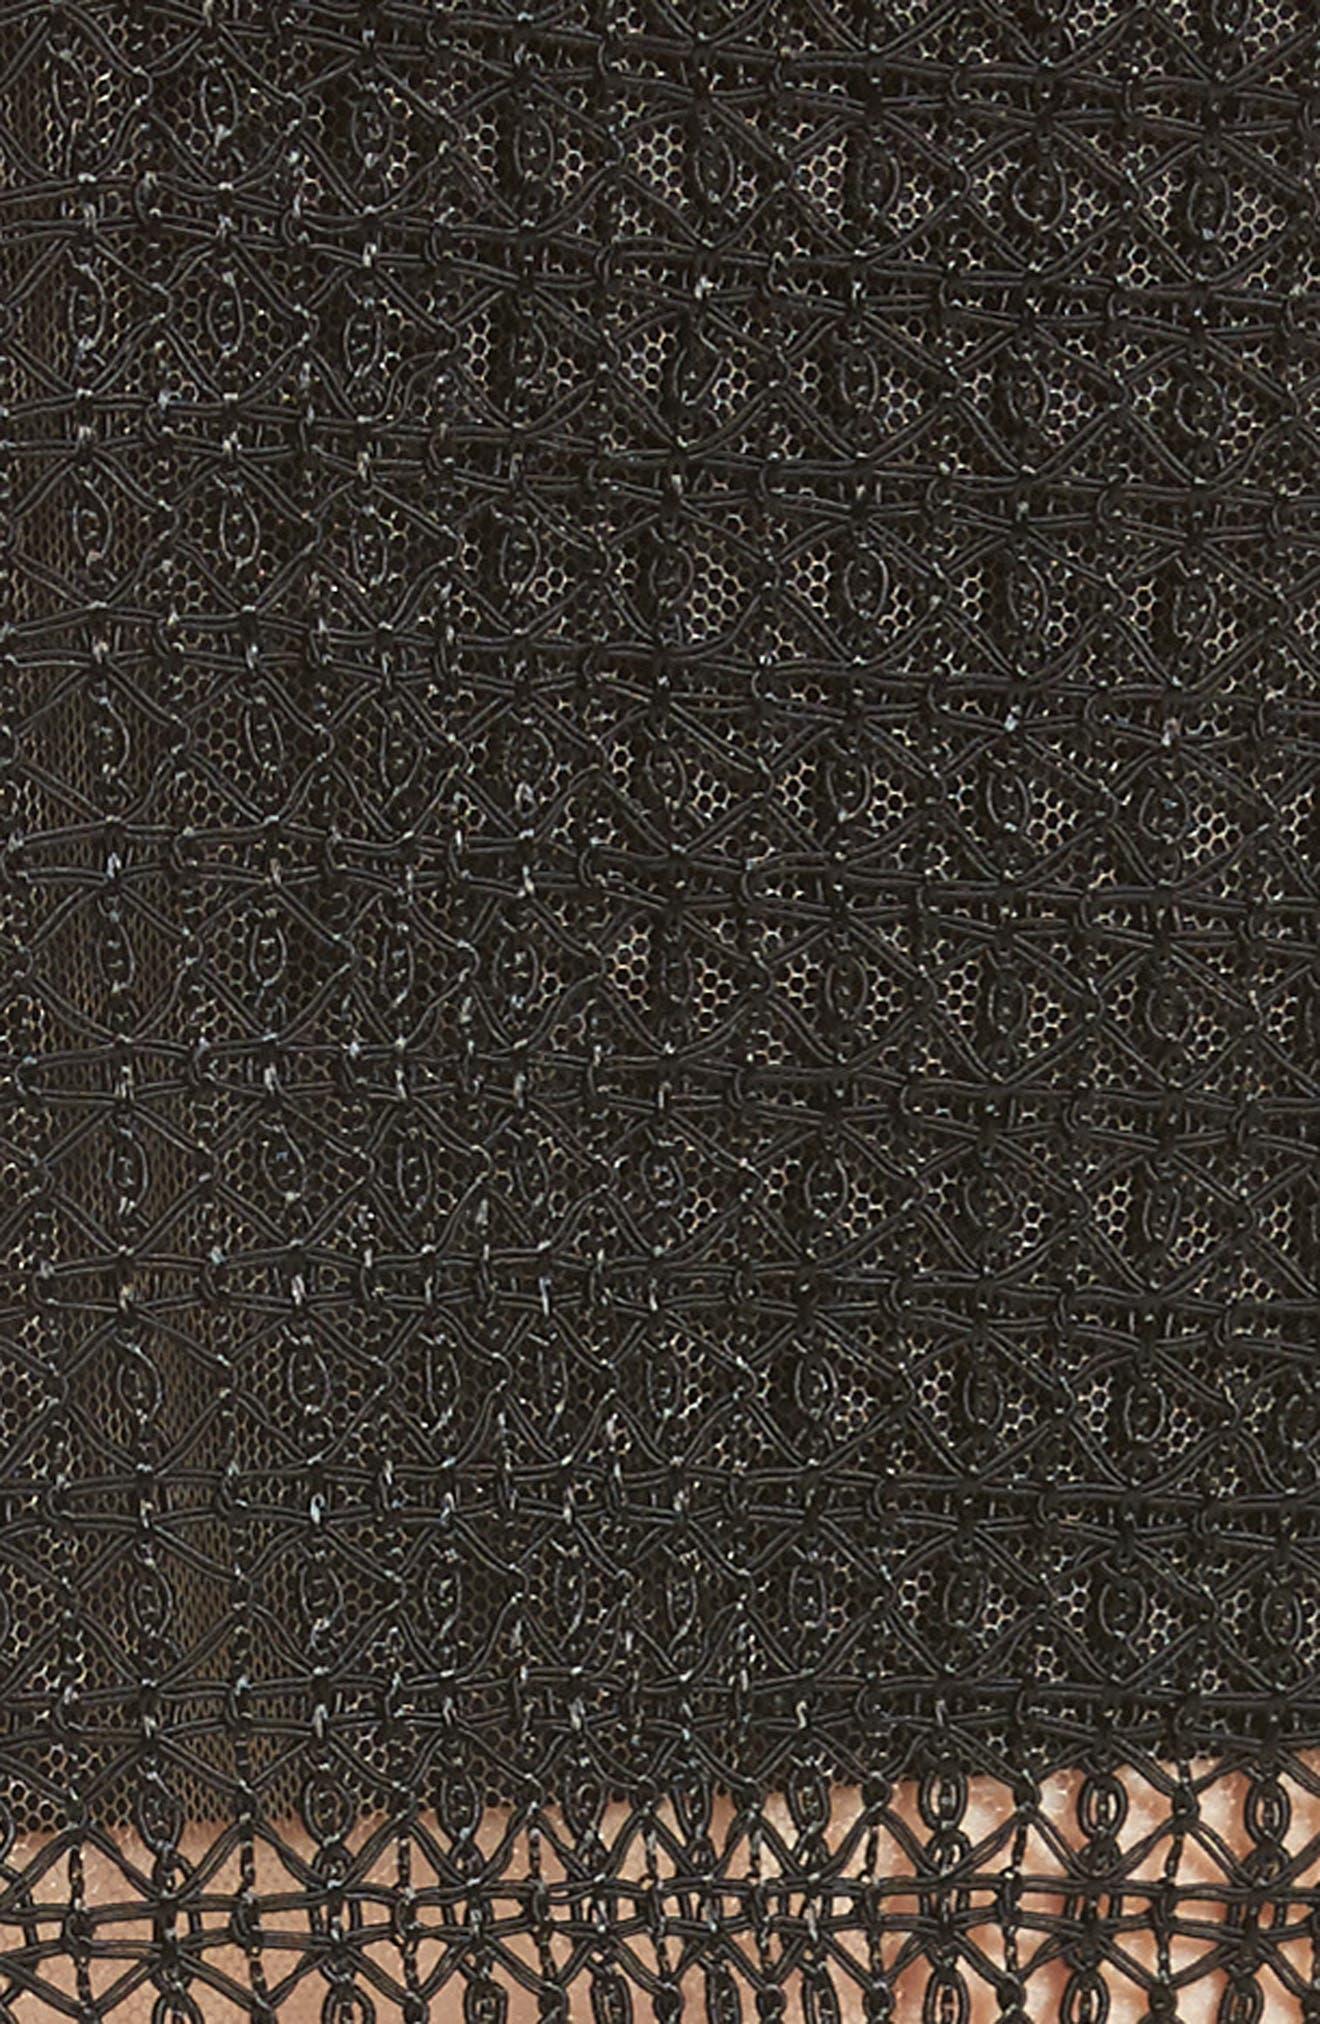 Geometric Lace Top,                             Alternate thumbnail 5, color,                             001